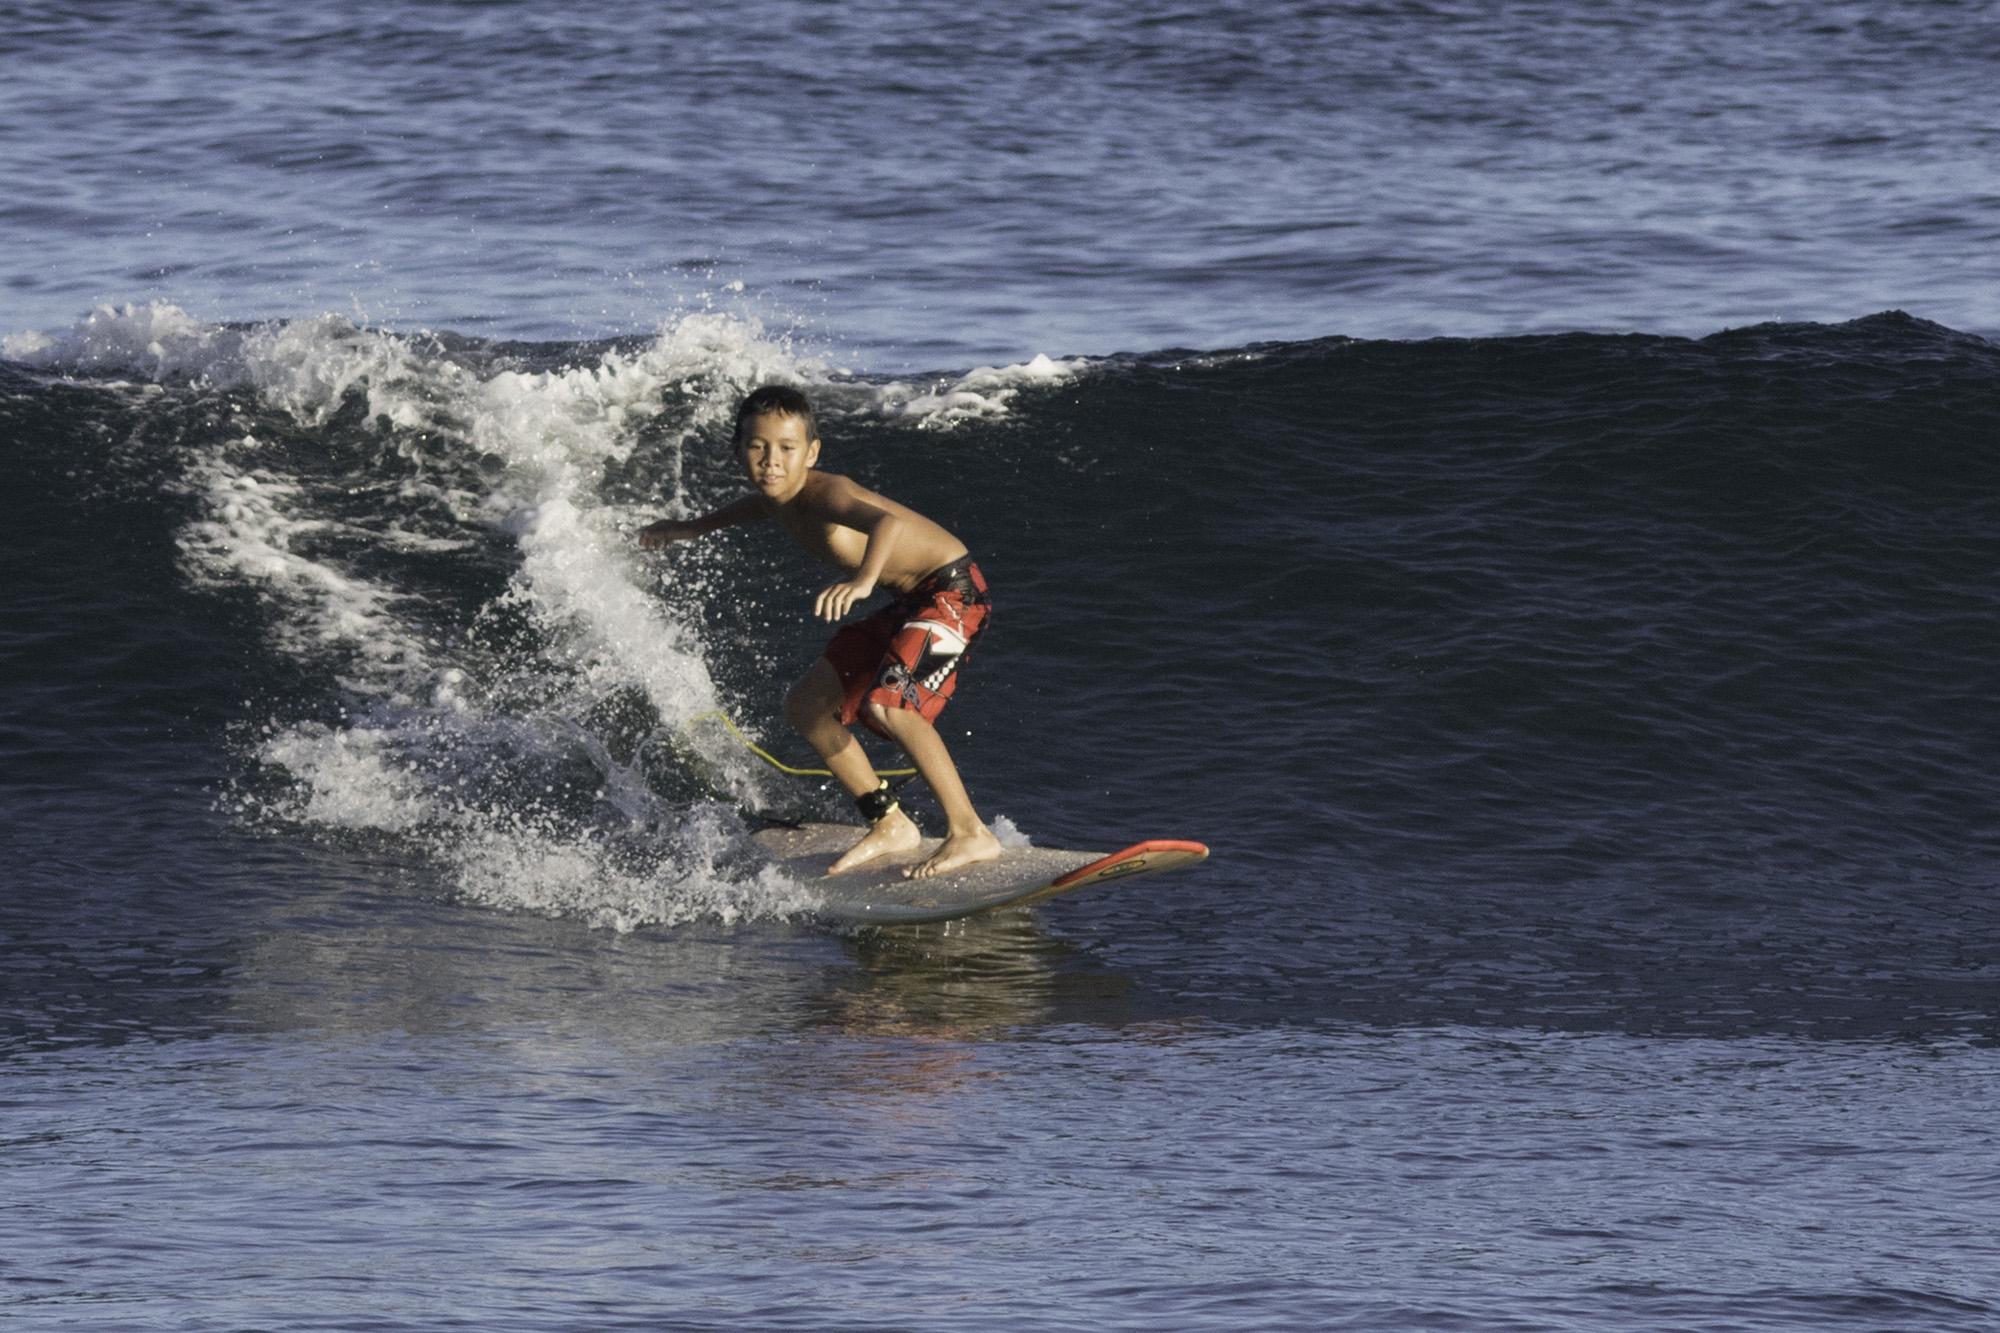 3ec2077b63 NORTH SHORE MENEHUNE SURF CONTEST 2016